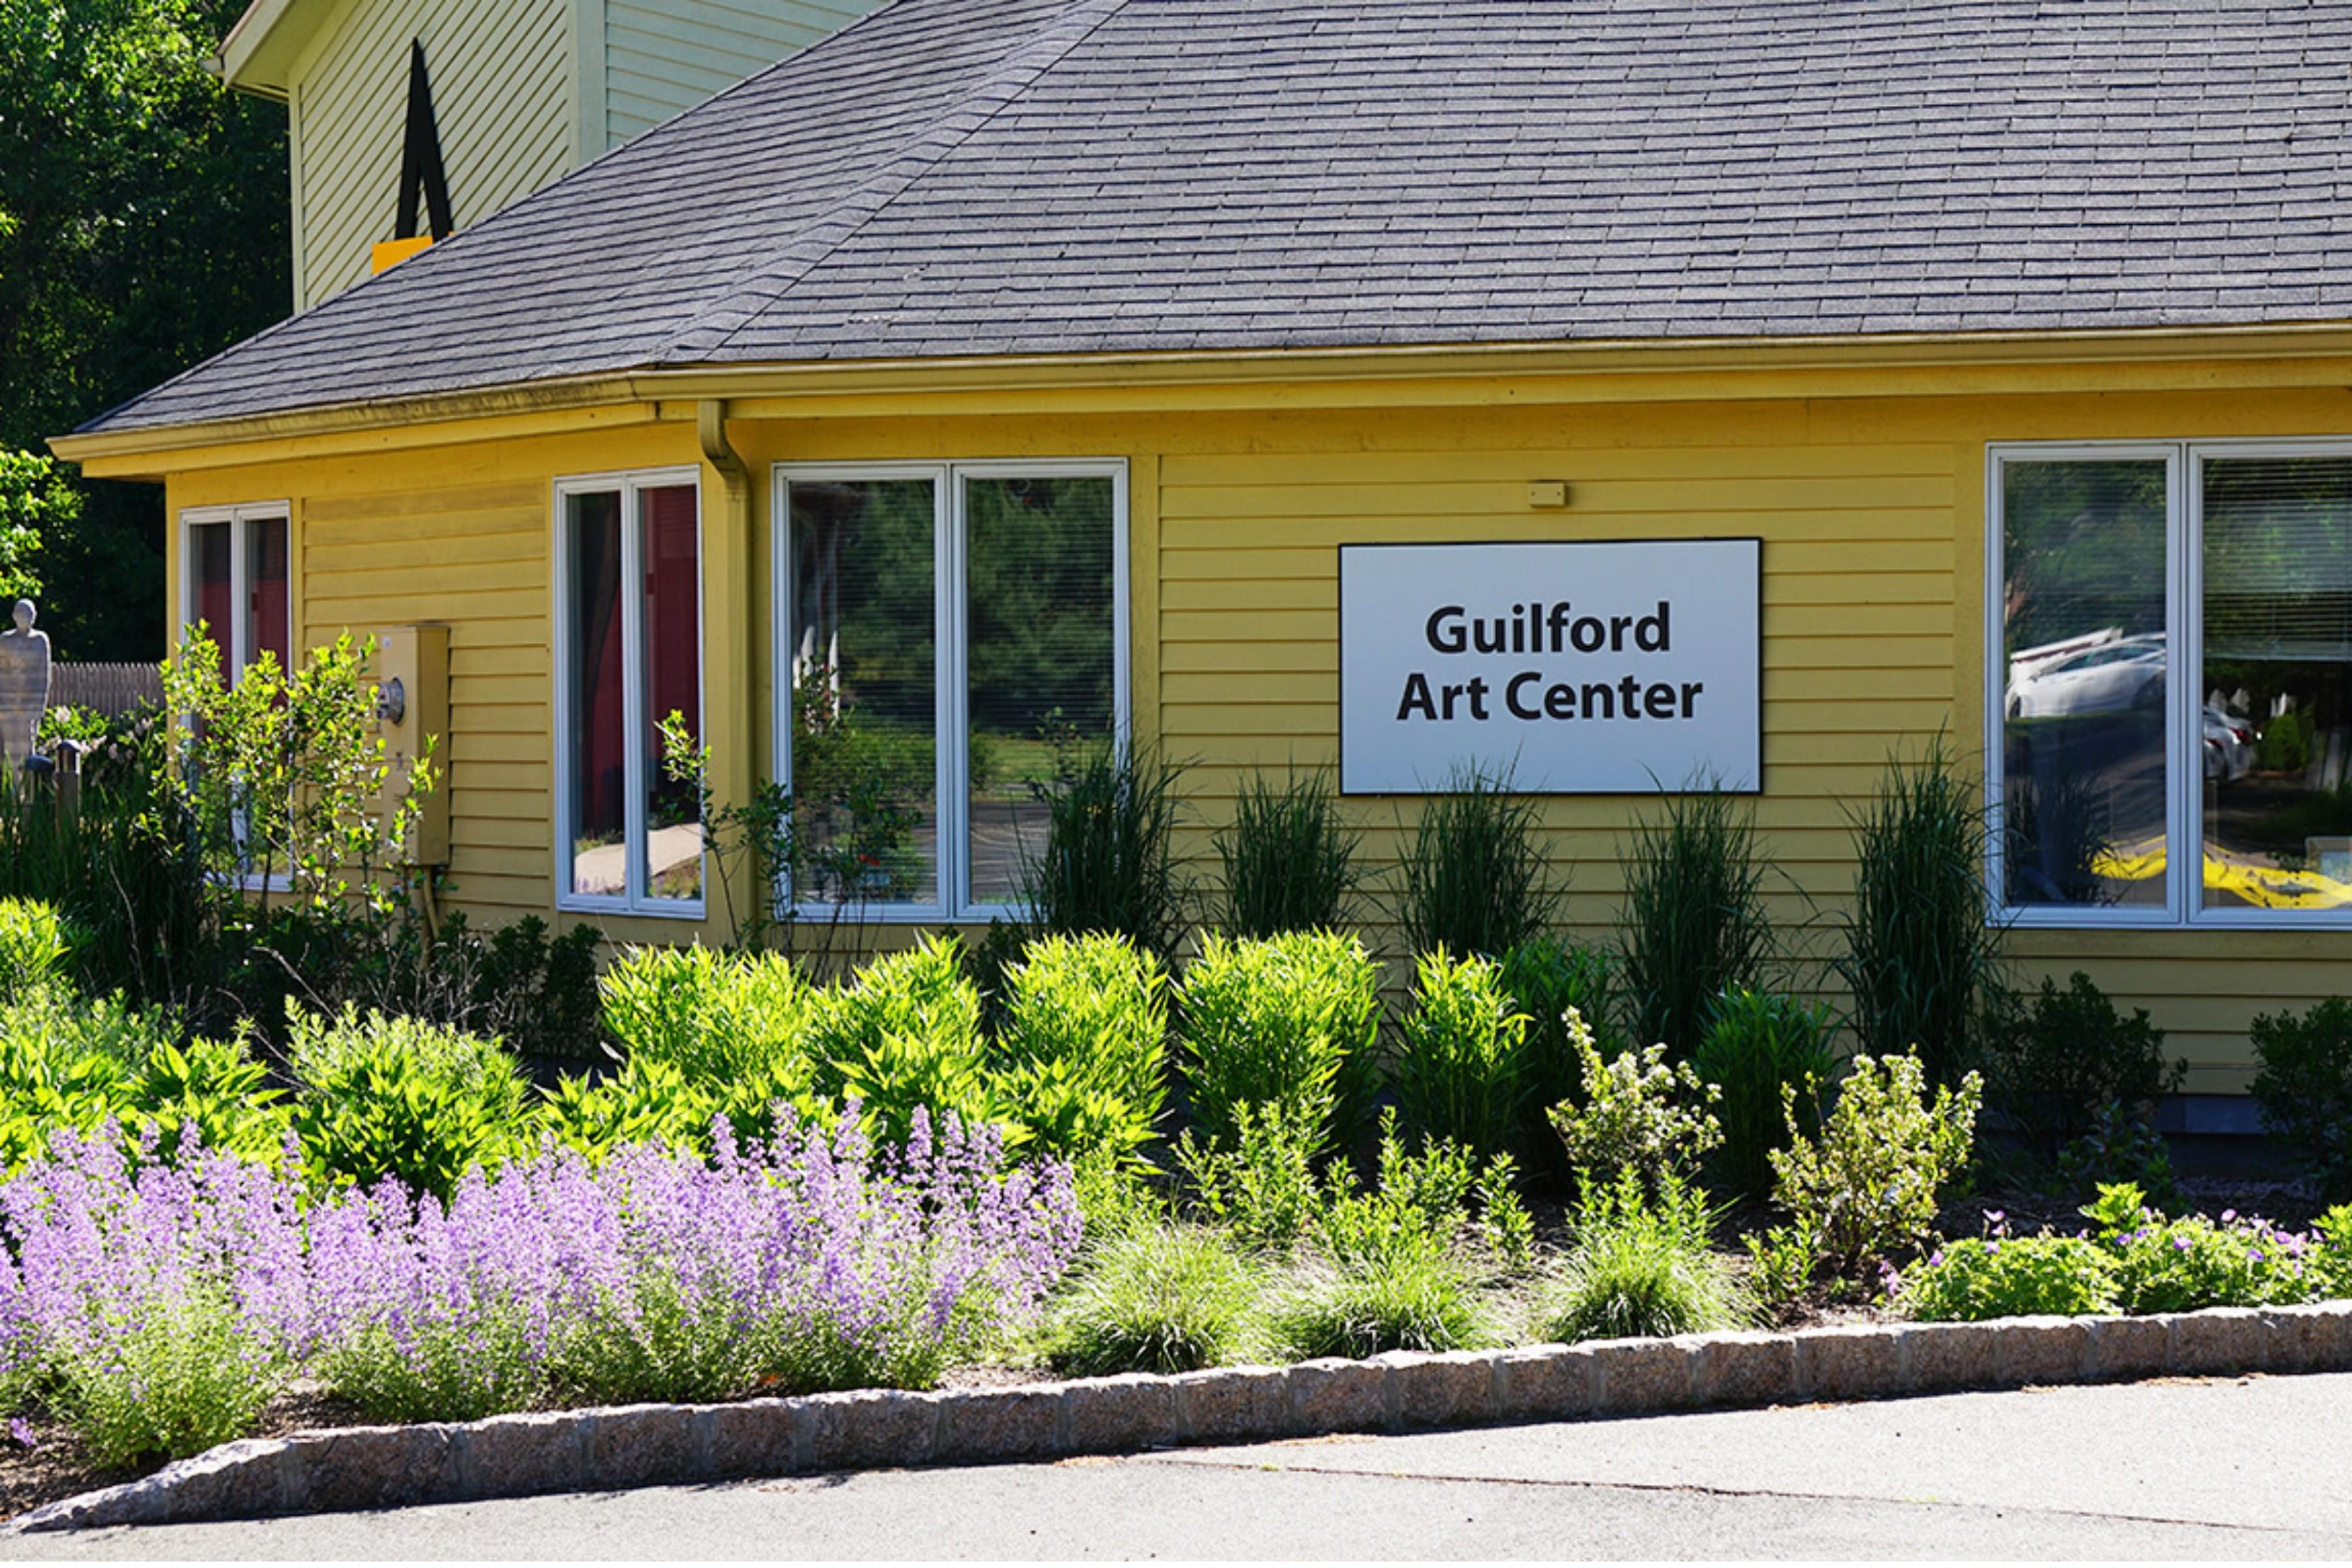 Guilford Art Center